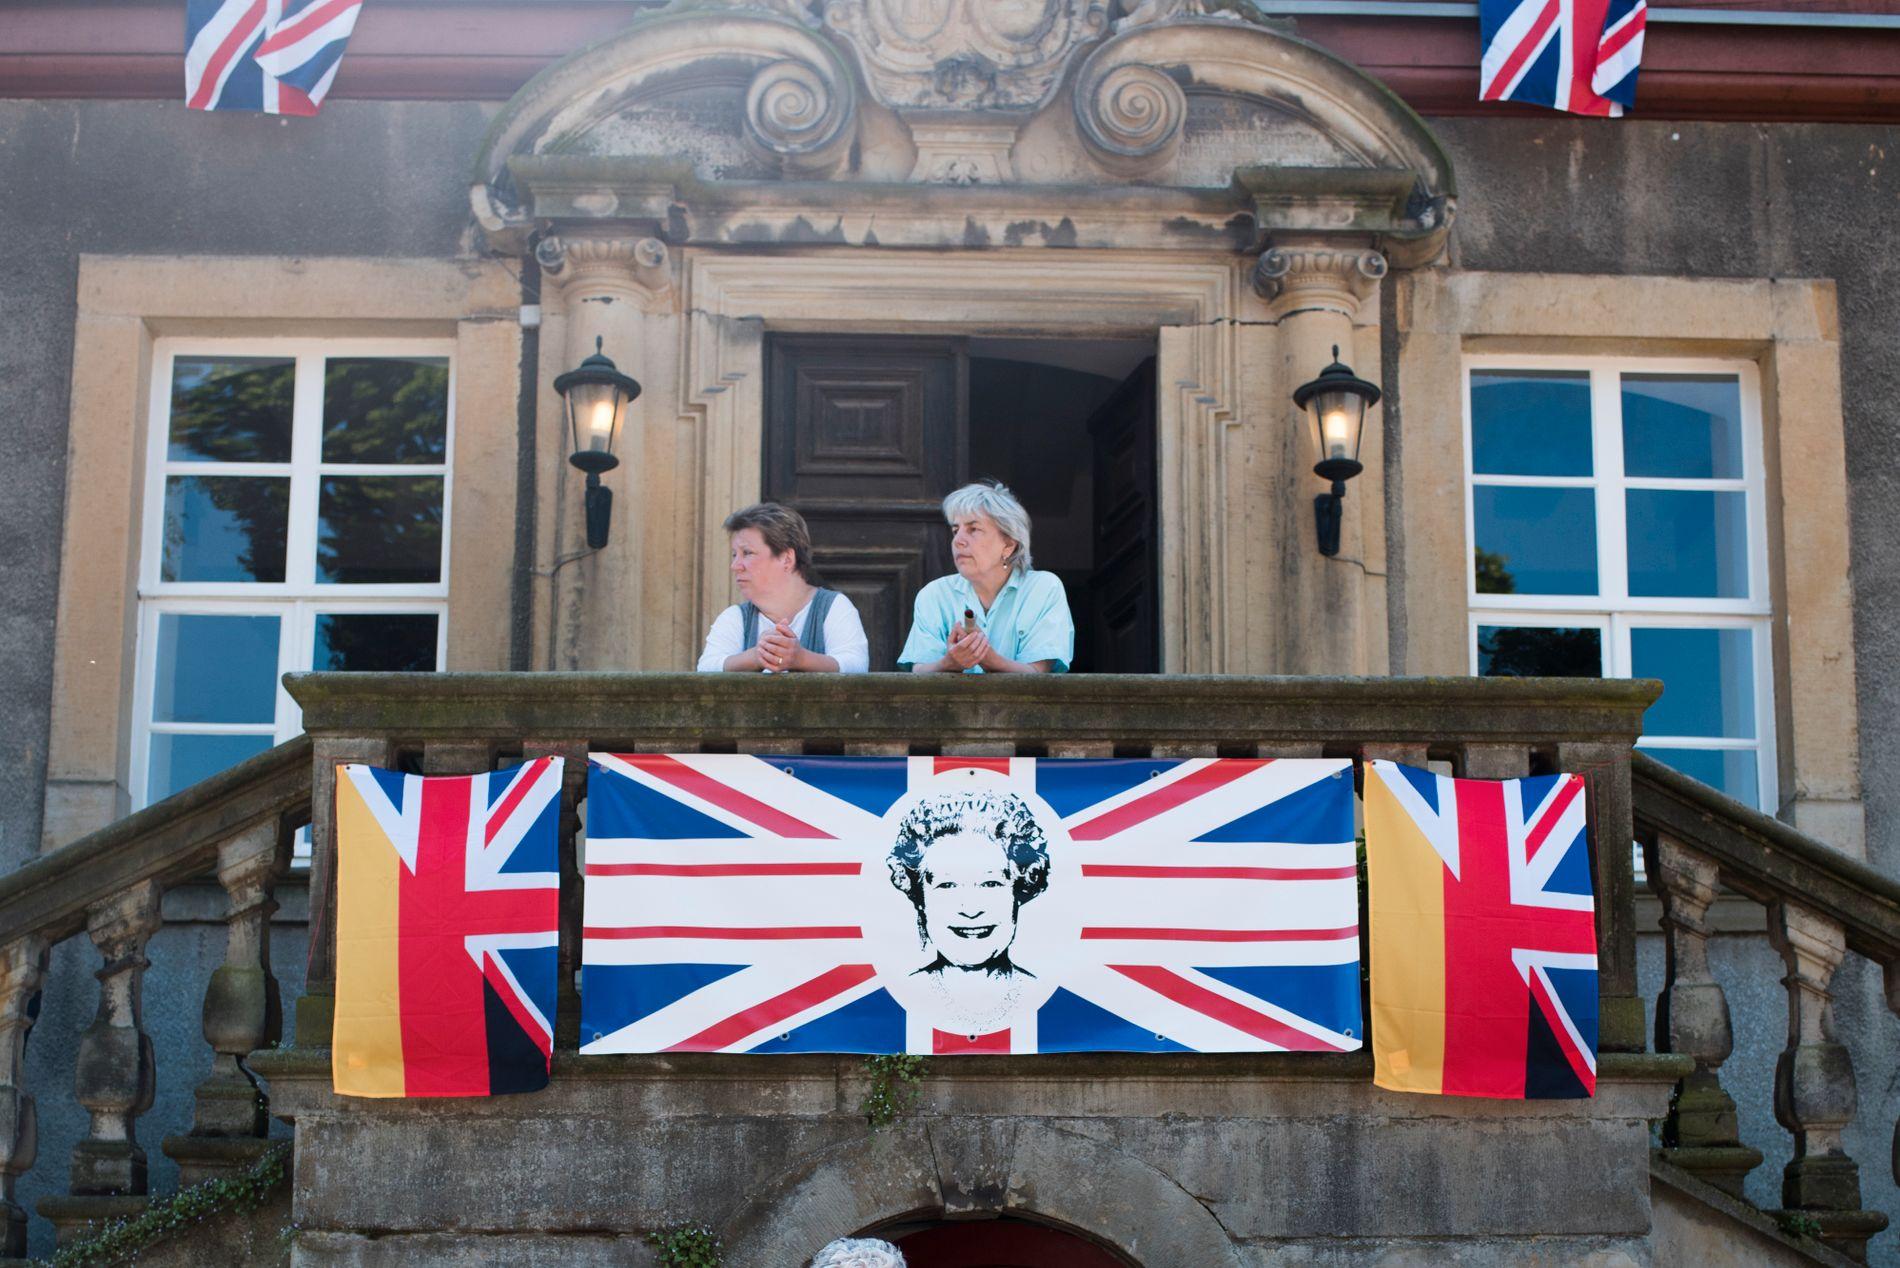 DRONNIGEN ER ALLTID MED: Det britiske kongehusets overhode figurerer på flagg og pappfigurer rundt på hele det tyske godset utenfor Hannover. Foto: Lia Darjes, VG